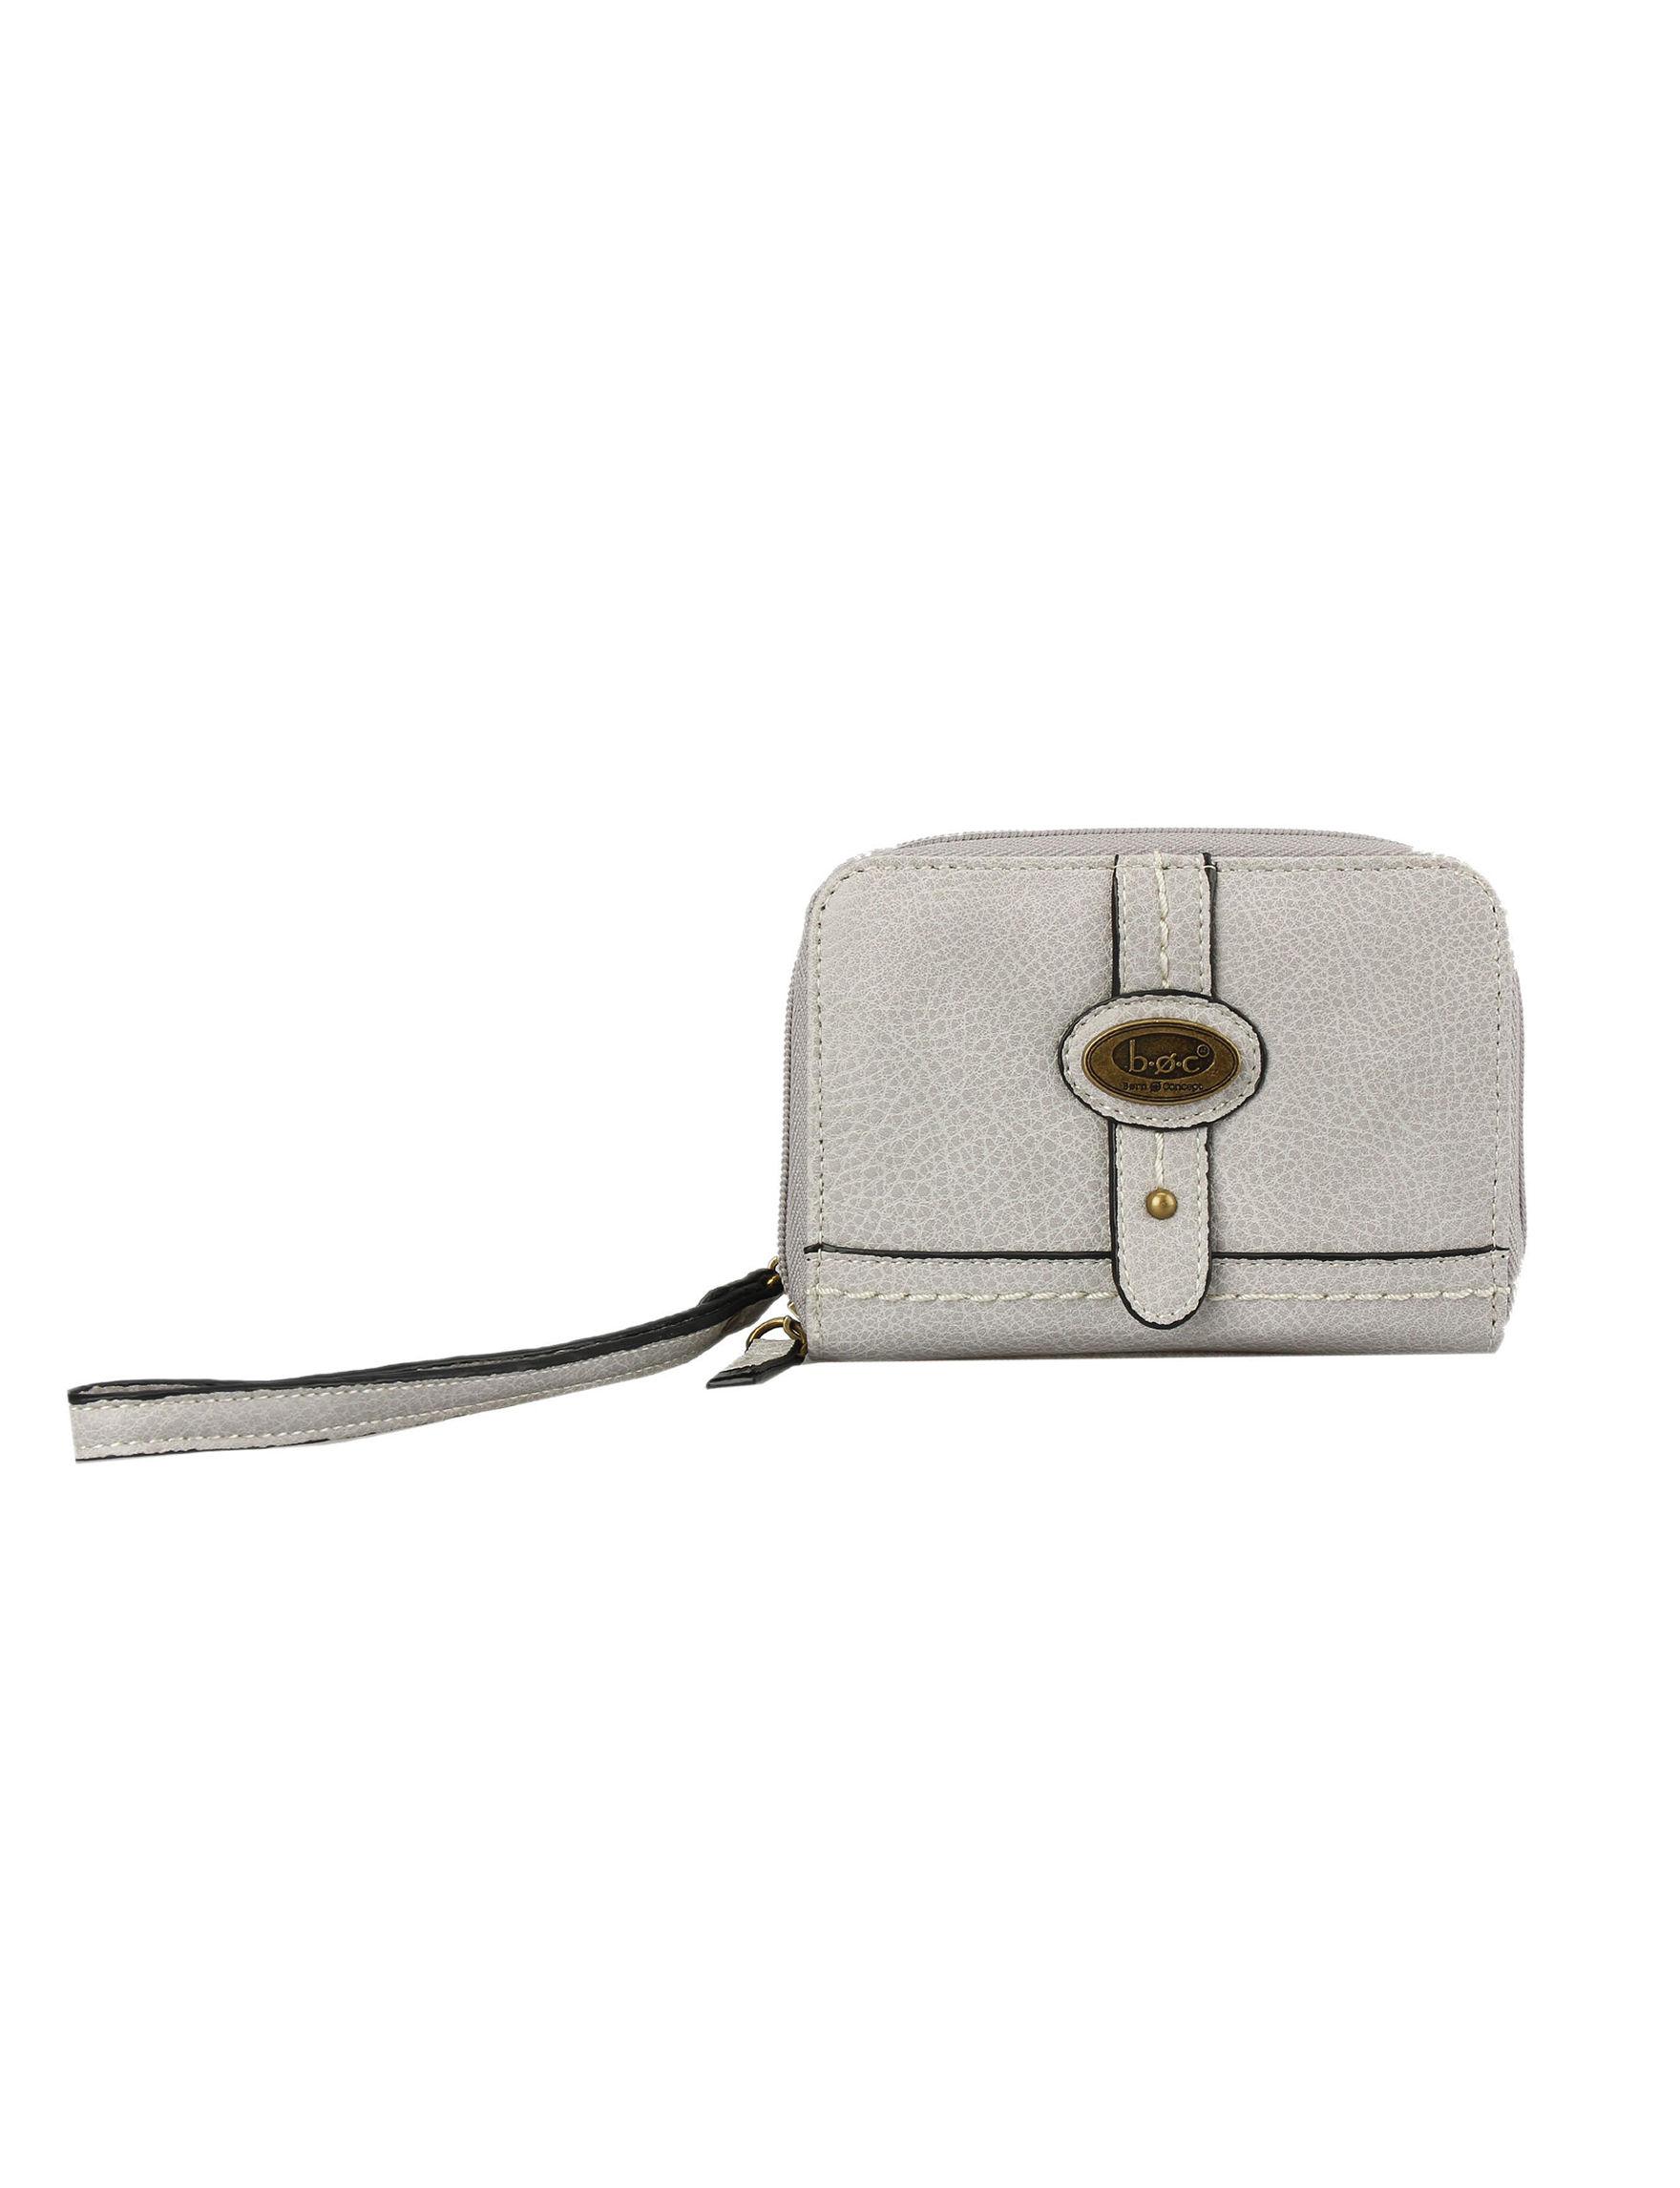 B.O.C. Grey Wallet Wristlet